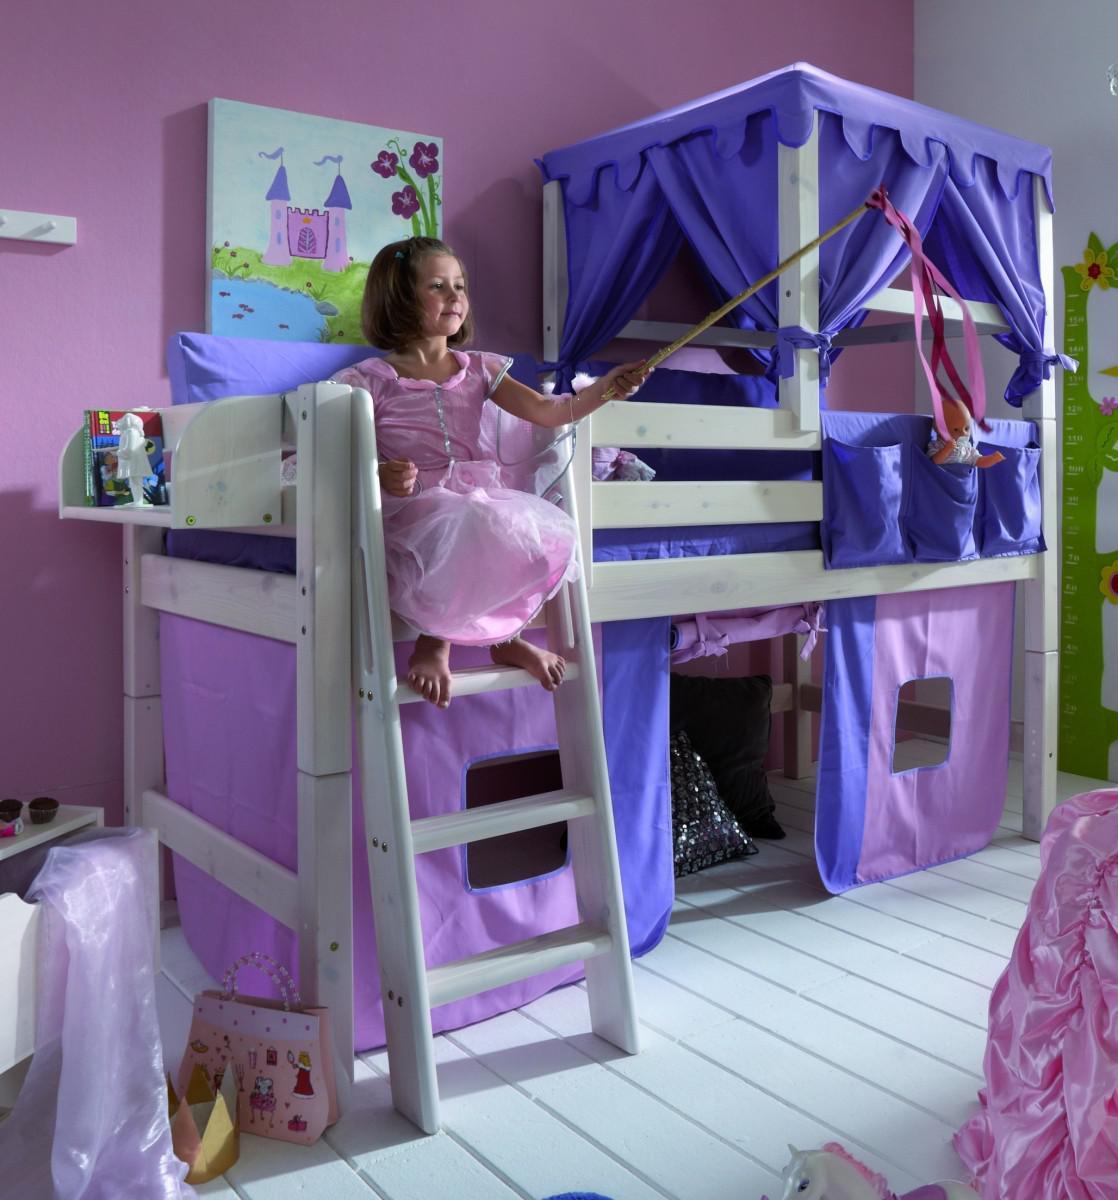 Full Size of Kinderbett Mädchen 5383ea3b29a8c Betten Bett Wohnzimmer Kinderbett Mädchen